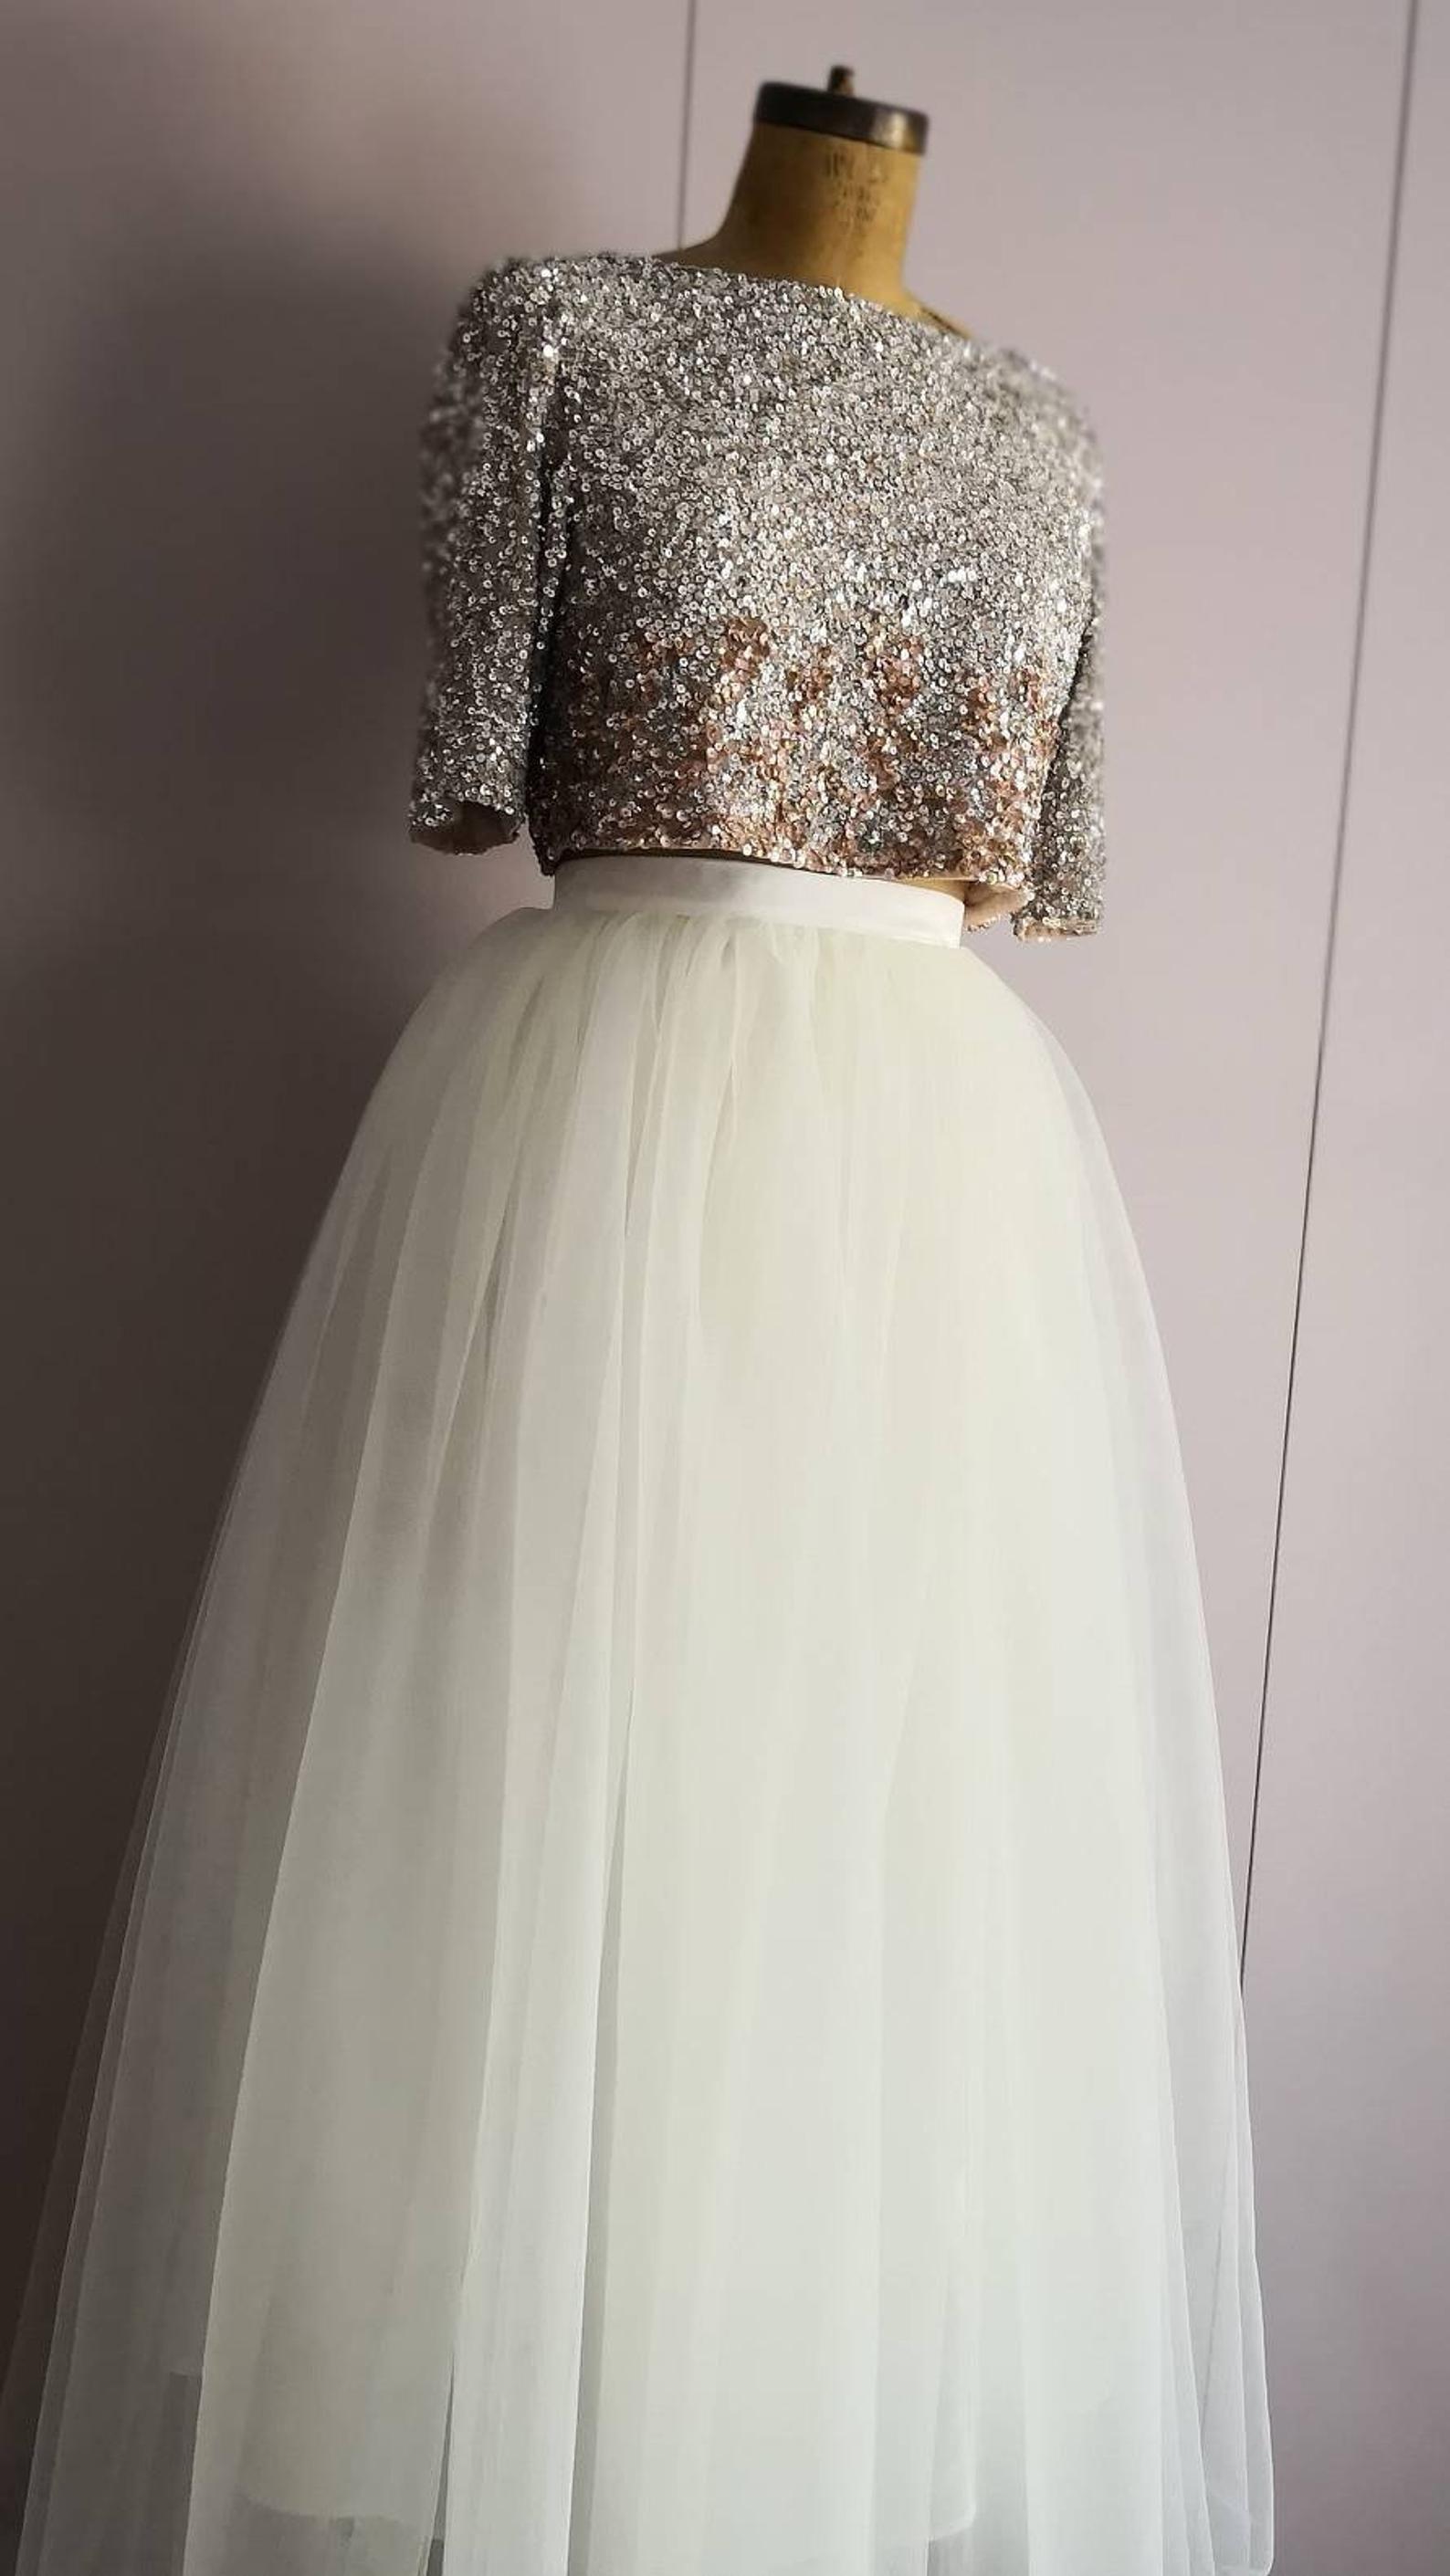 Photo of Full Length Ivory Tulle Bridal Skirt, Long Tulle Bridesmaid Skirt, Wedding Separates, Custom Made To Measure Wedding Skirts, Handmade UK